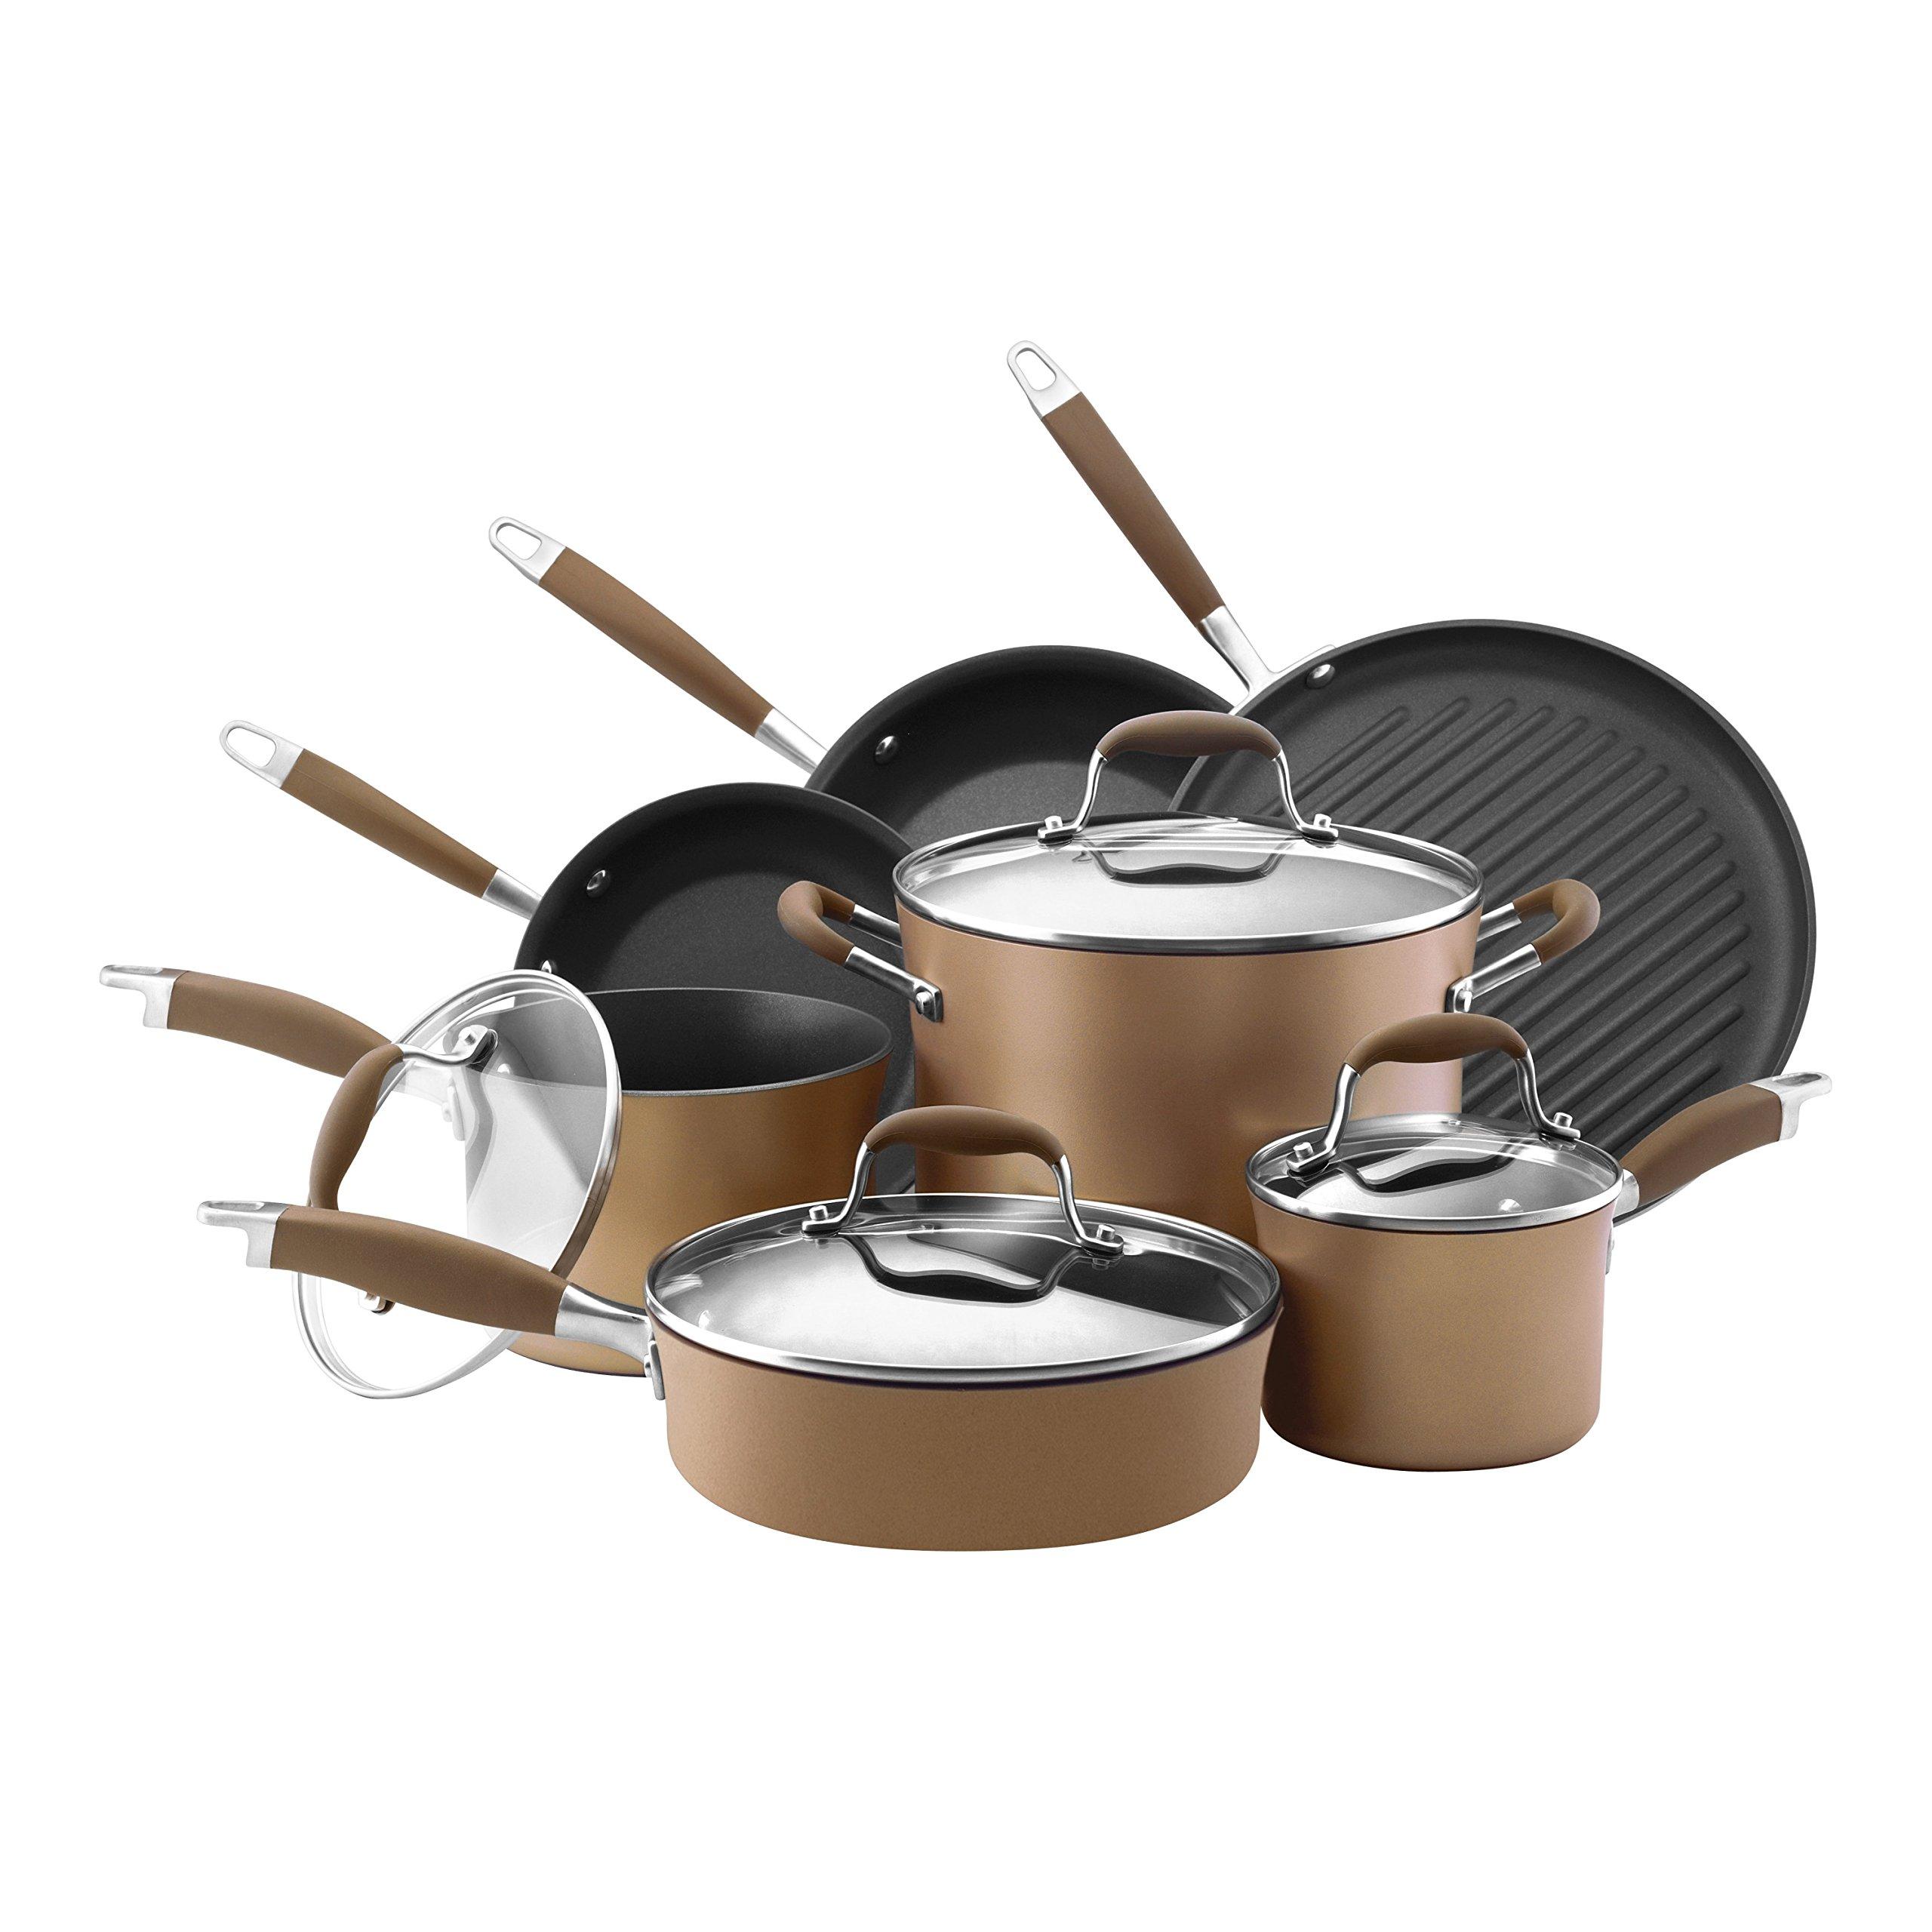 Anolon Advanced Bronze Hard-Anodized Nonstick 11-Piece Cookware Set